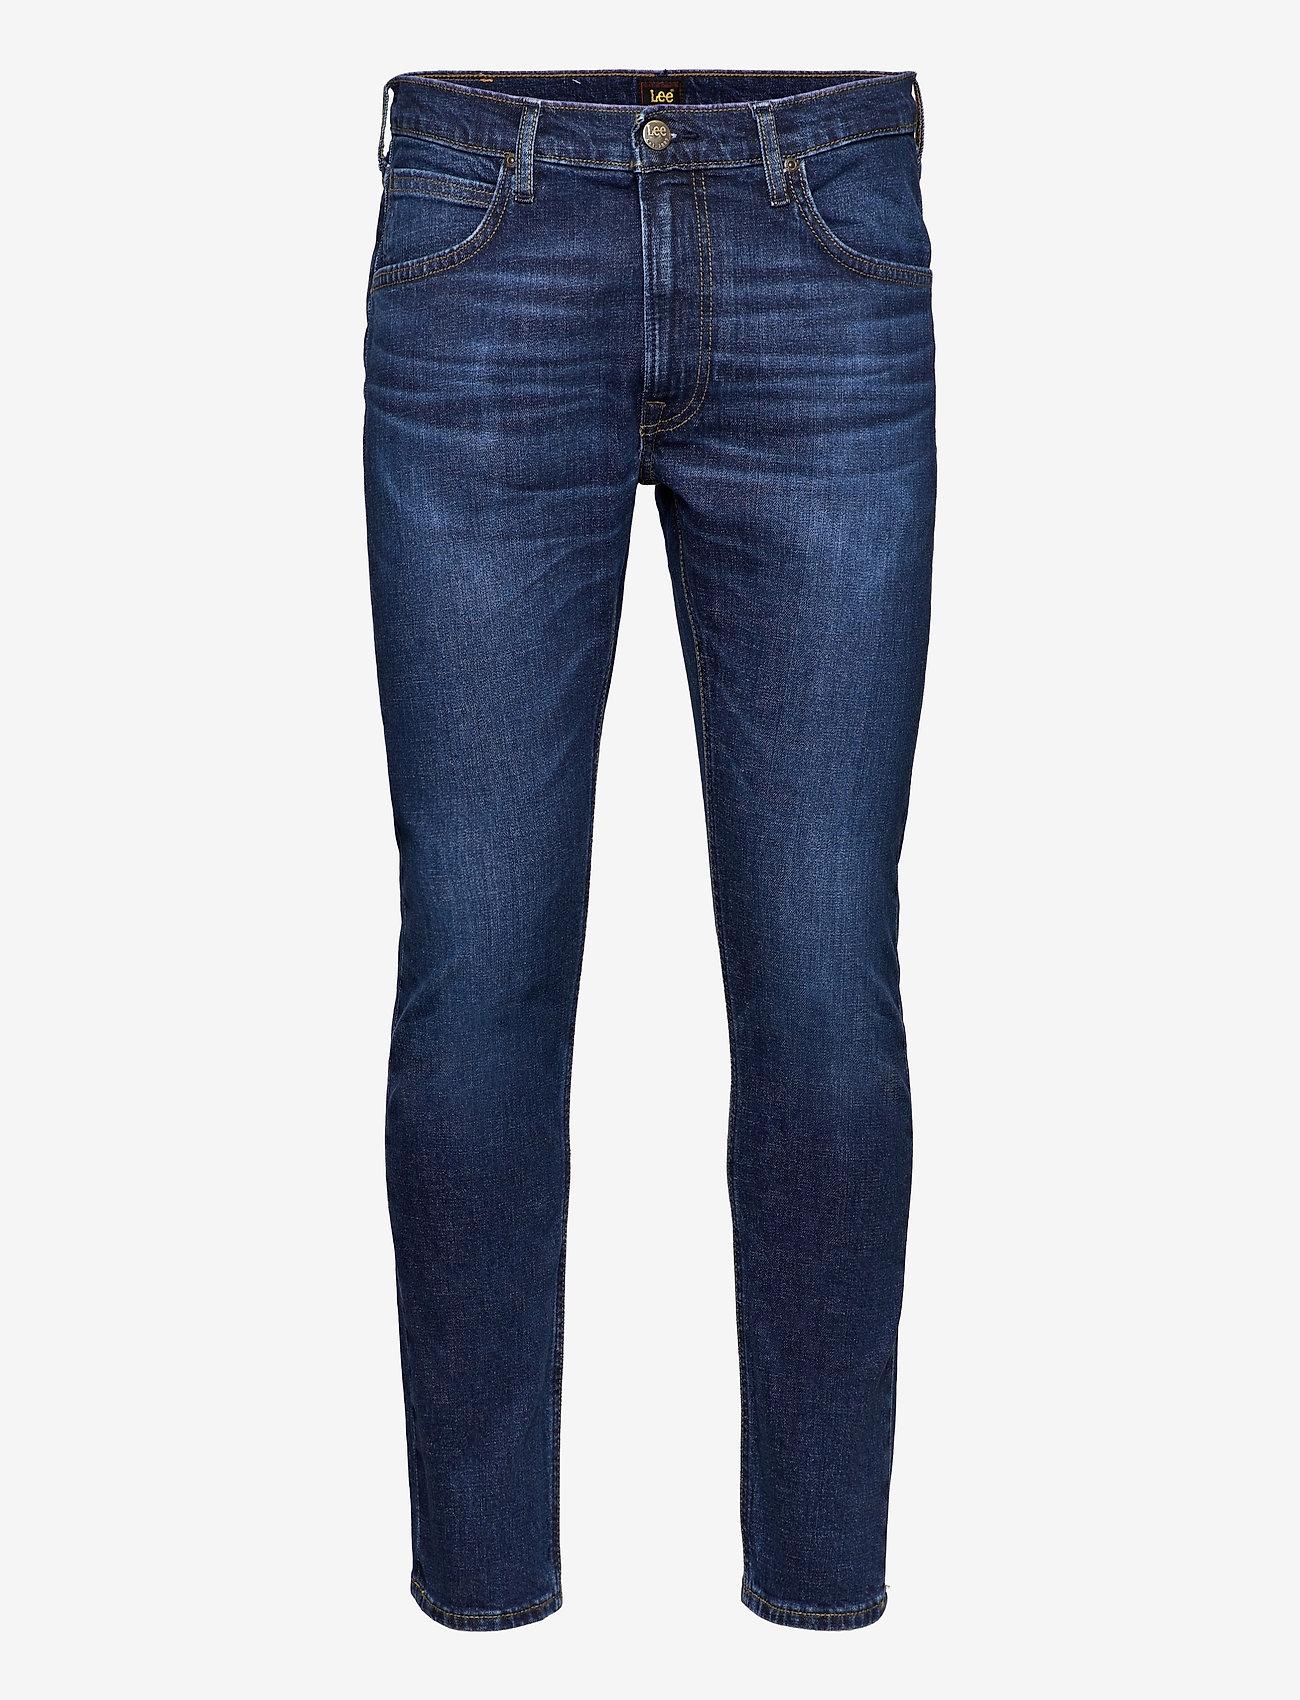 Lee Jeans - LUKE - slim jeans - dk worn kansas - 0